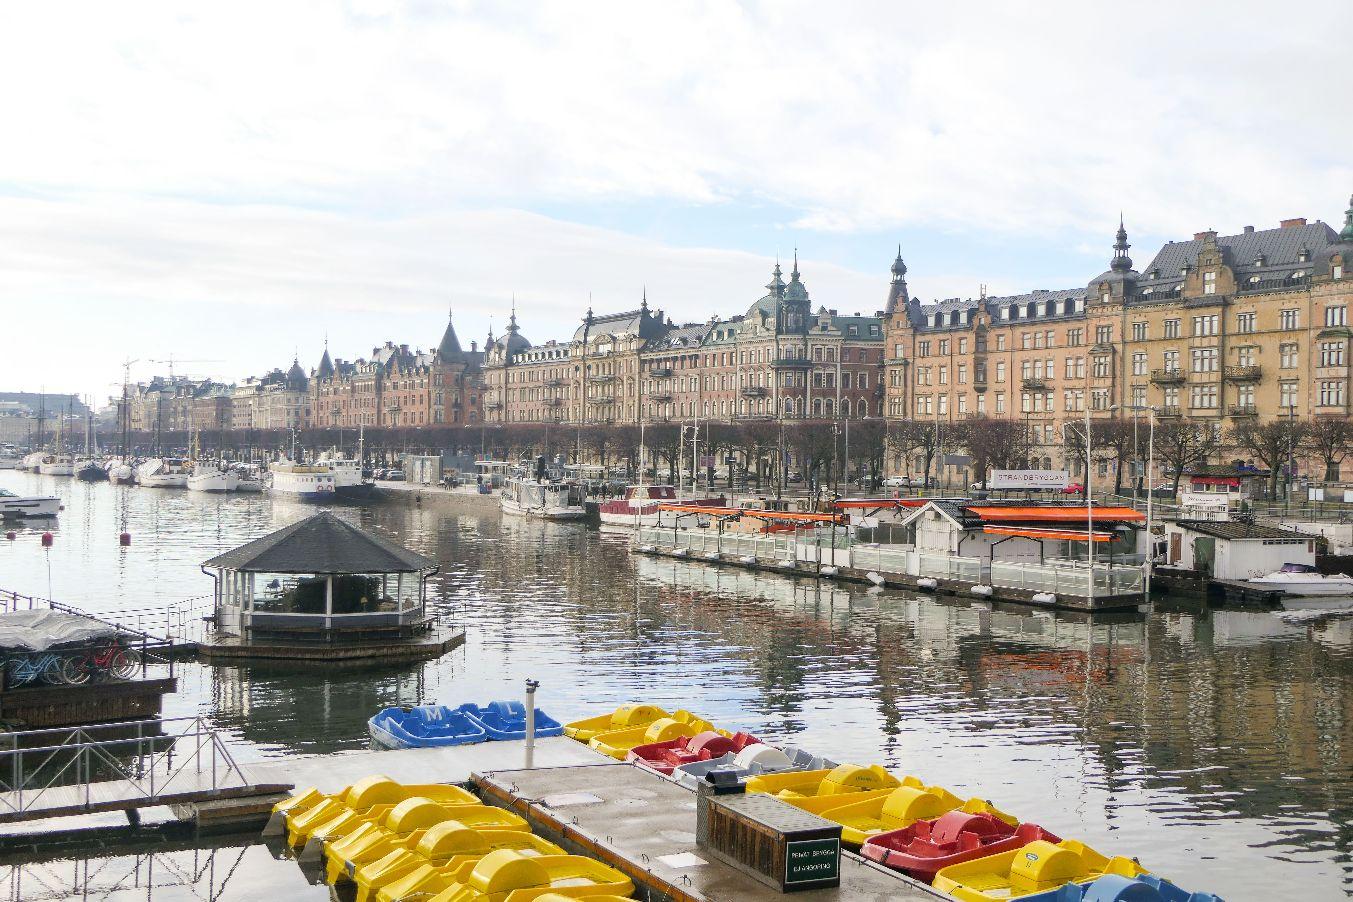 Stockholm Schweden Djurgardsbron Strandvägen Prachtstraße